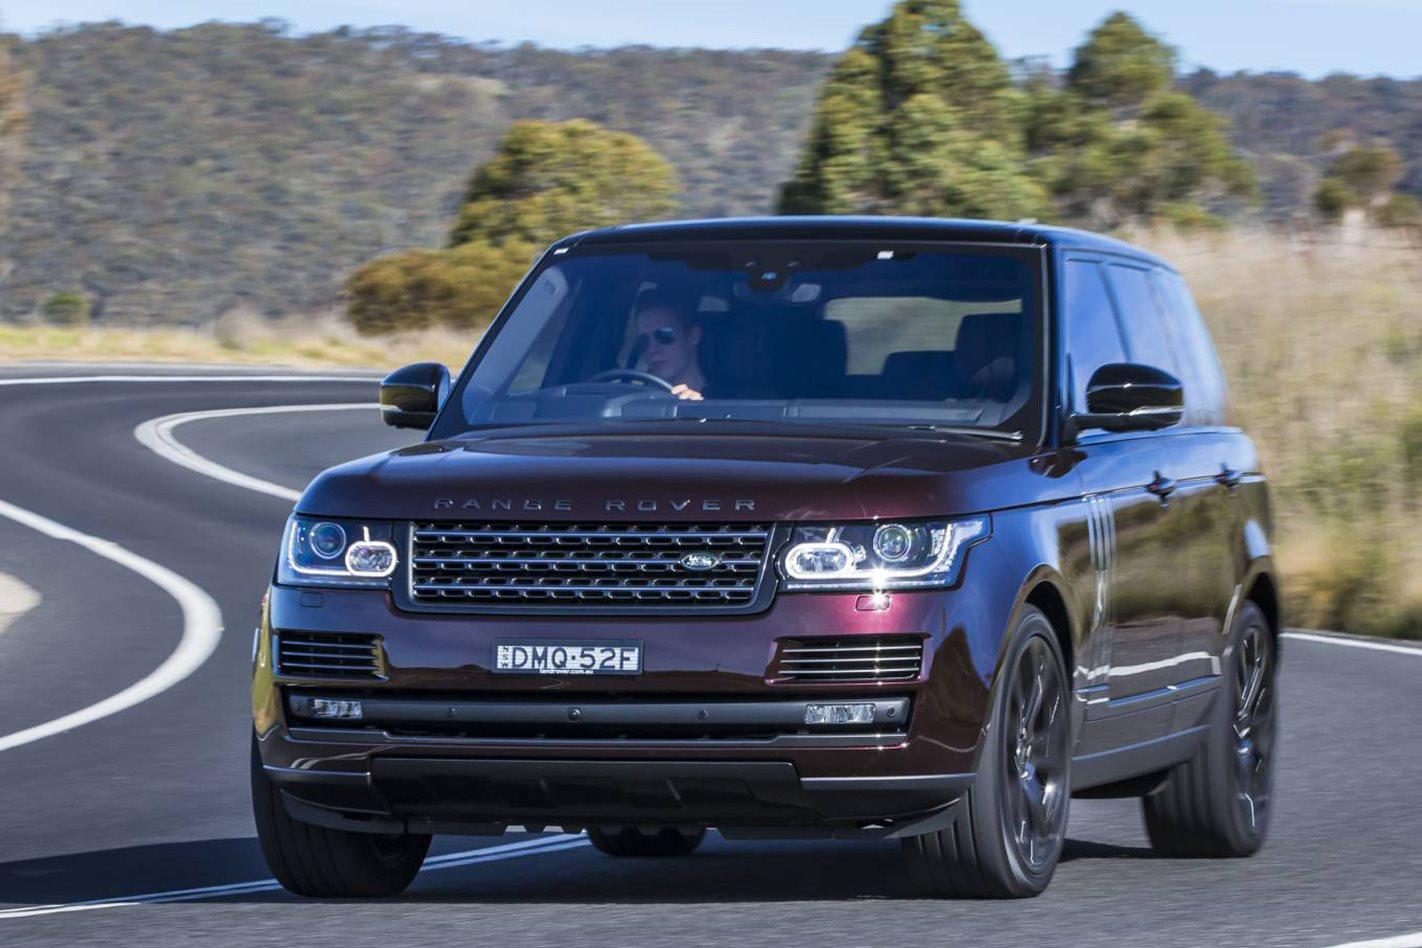 2018-Range-Rover-SVAutobiography-Dynamic.jpg